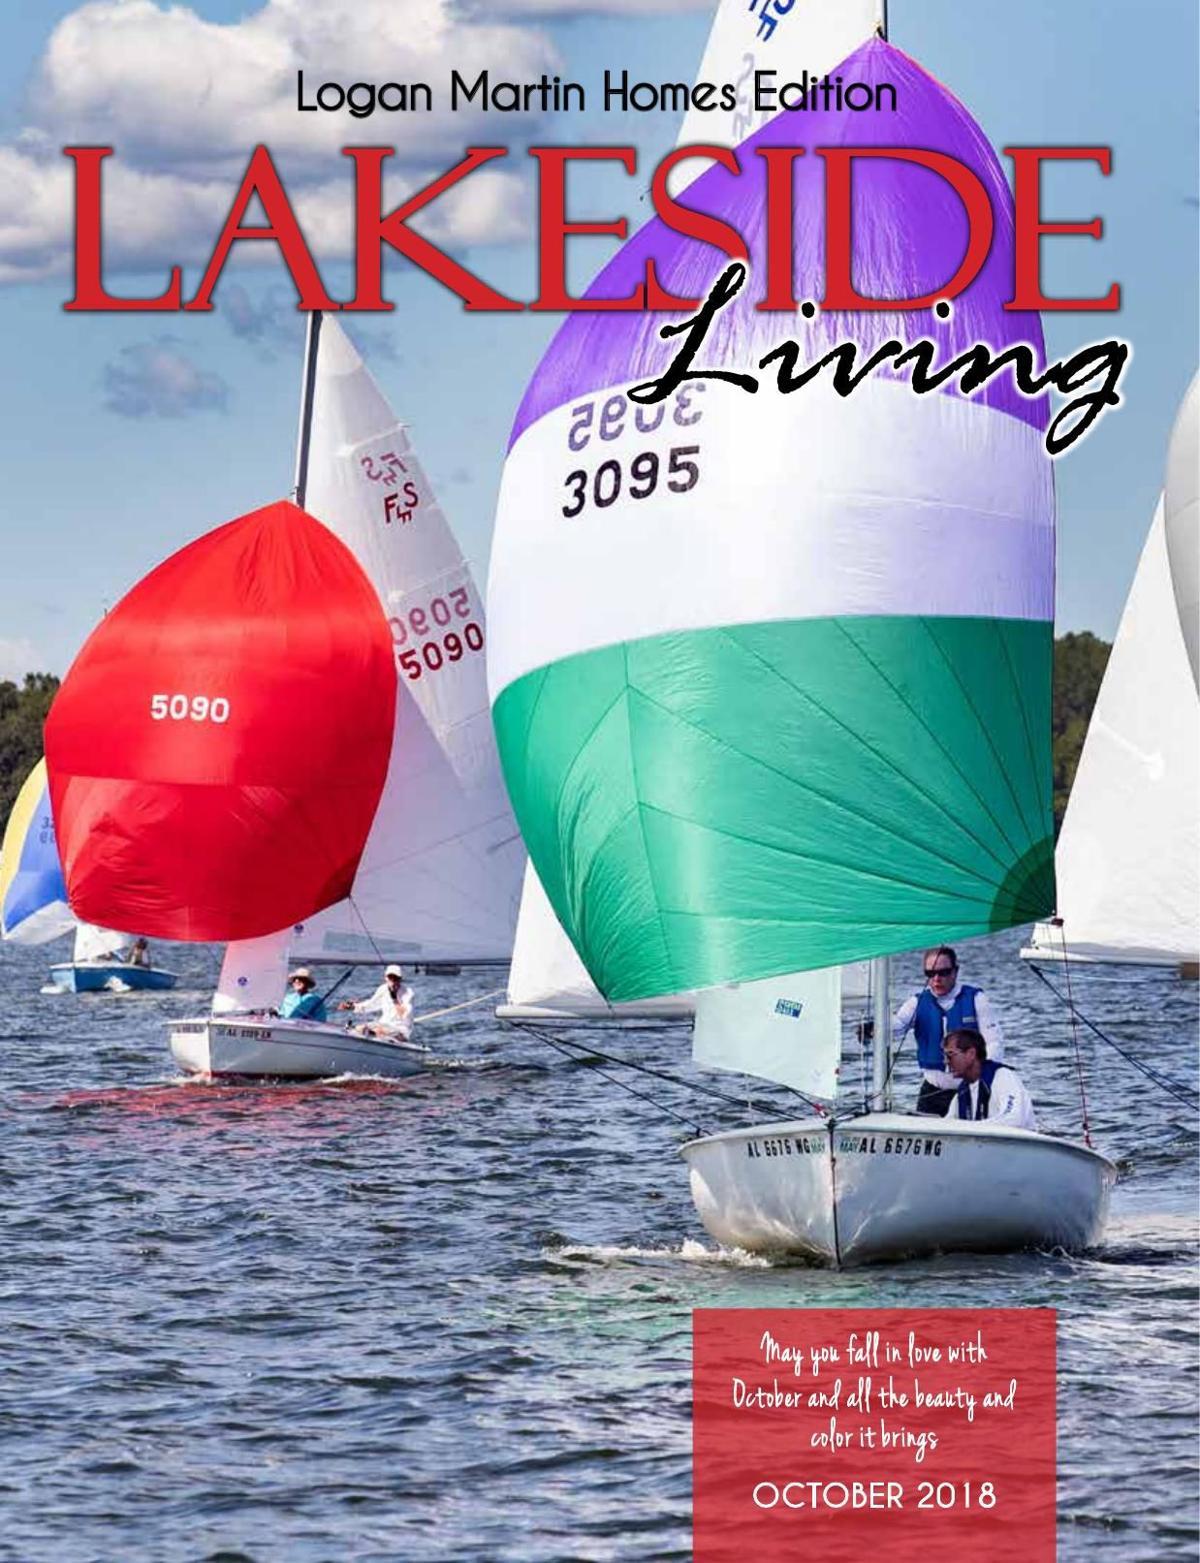 October Lakeside Living 2018